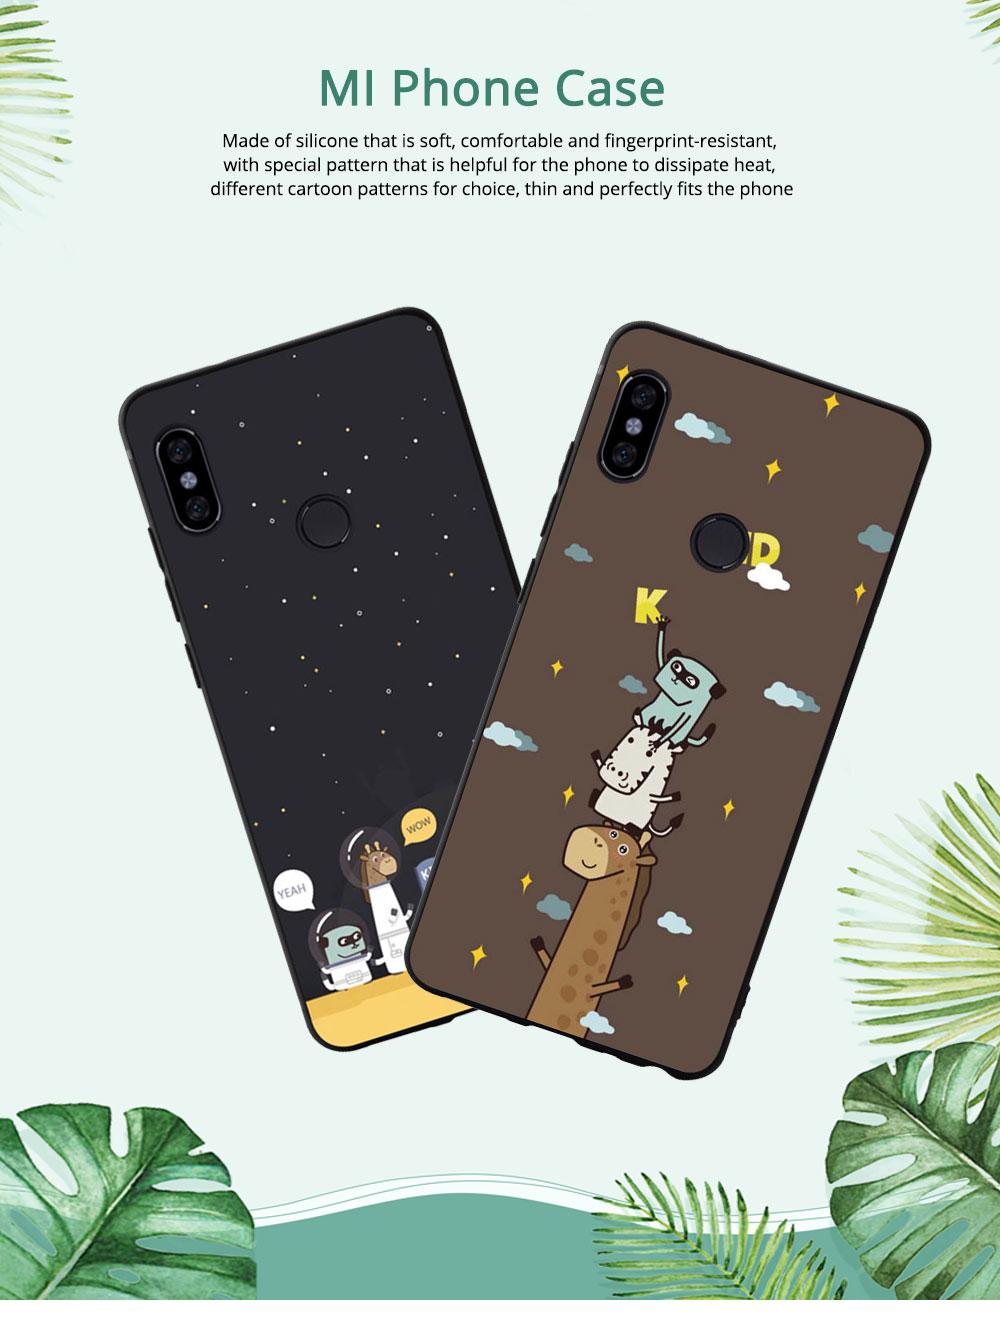 MI Phone Case for MI 8, MI 8 Explorer, MI 8 Lite, MI SE, MI 6X, Fingerprint-resistant Soft Silicone Phone Case Cover, Cartoon MI Protection Case 0